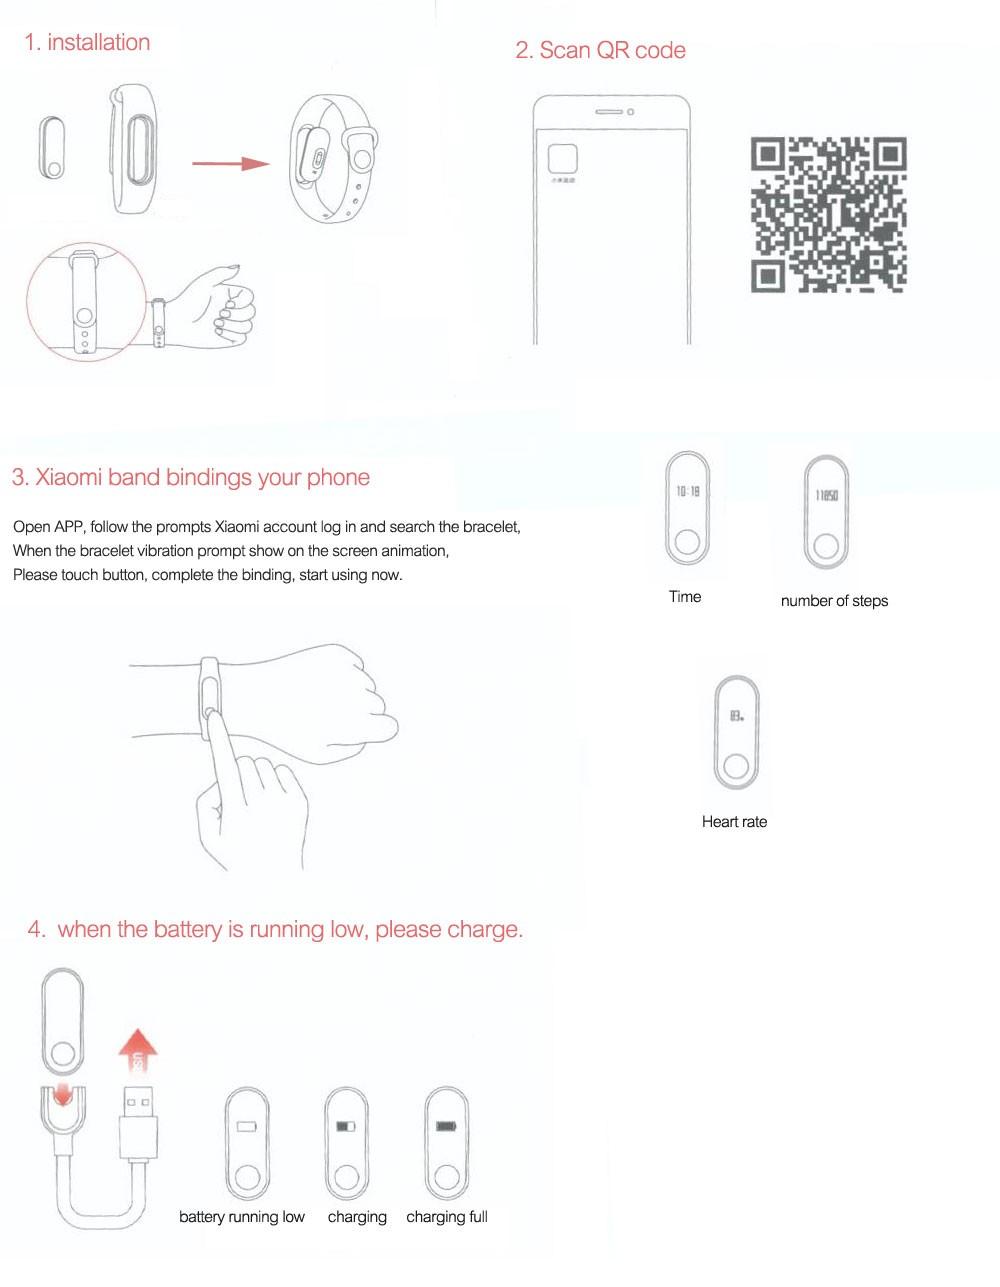 Xiaomi Mi Band 2 Miband 2 Smart Bracelet Wristband Band Fitness Tracker Bracelet Smartband Heart rate Monitor 100% Original (1)